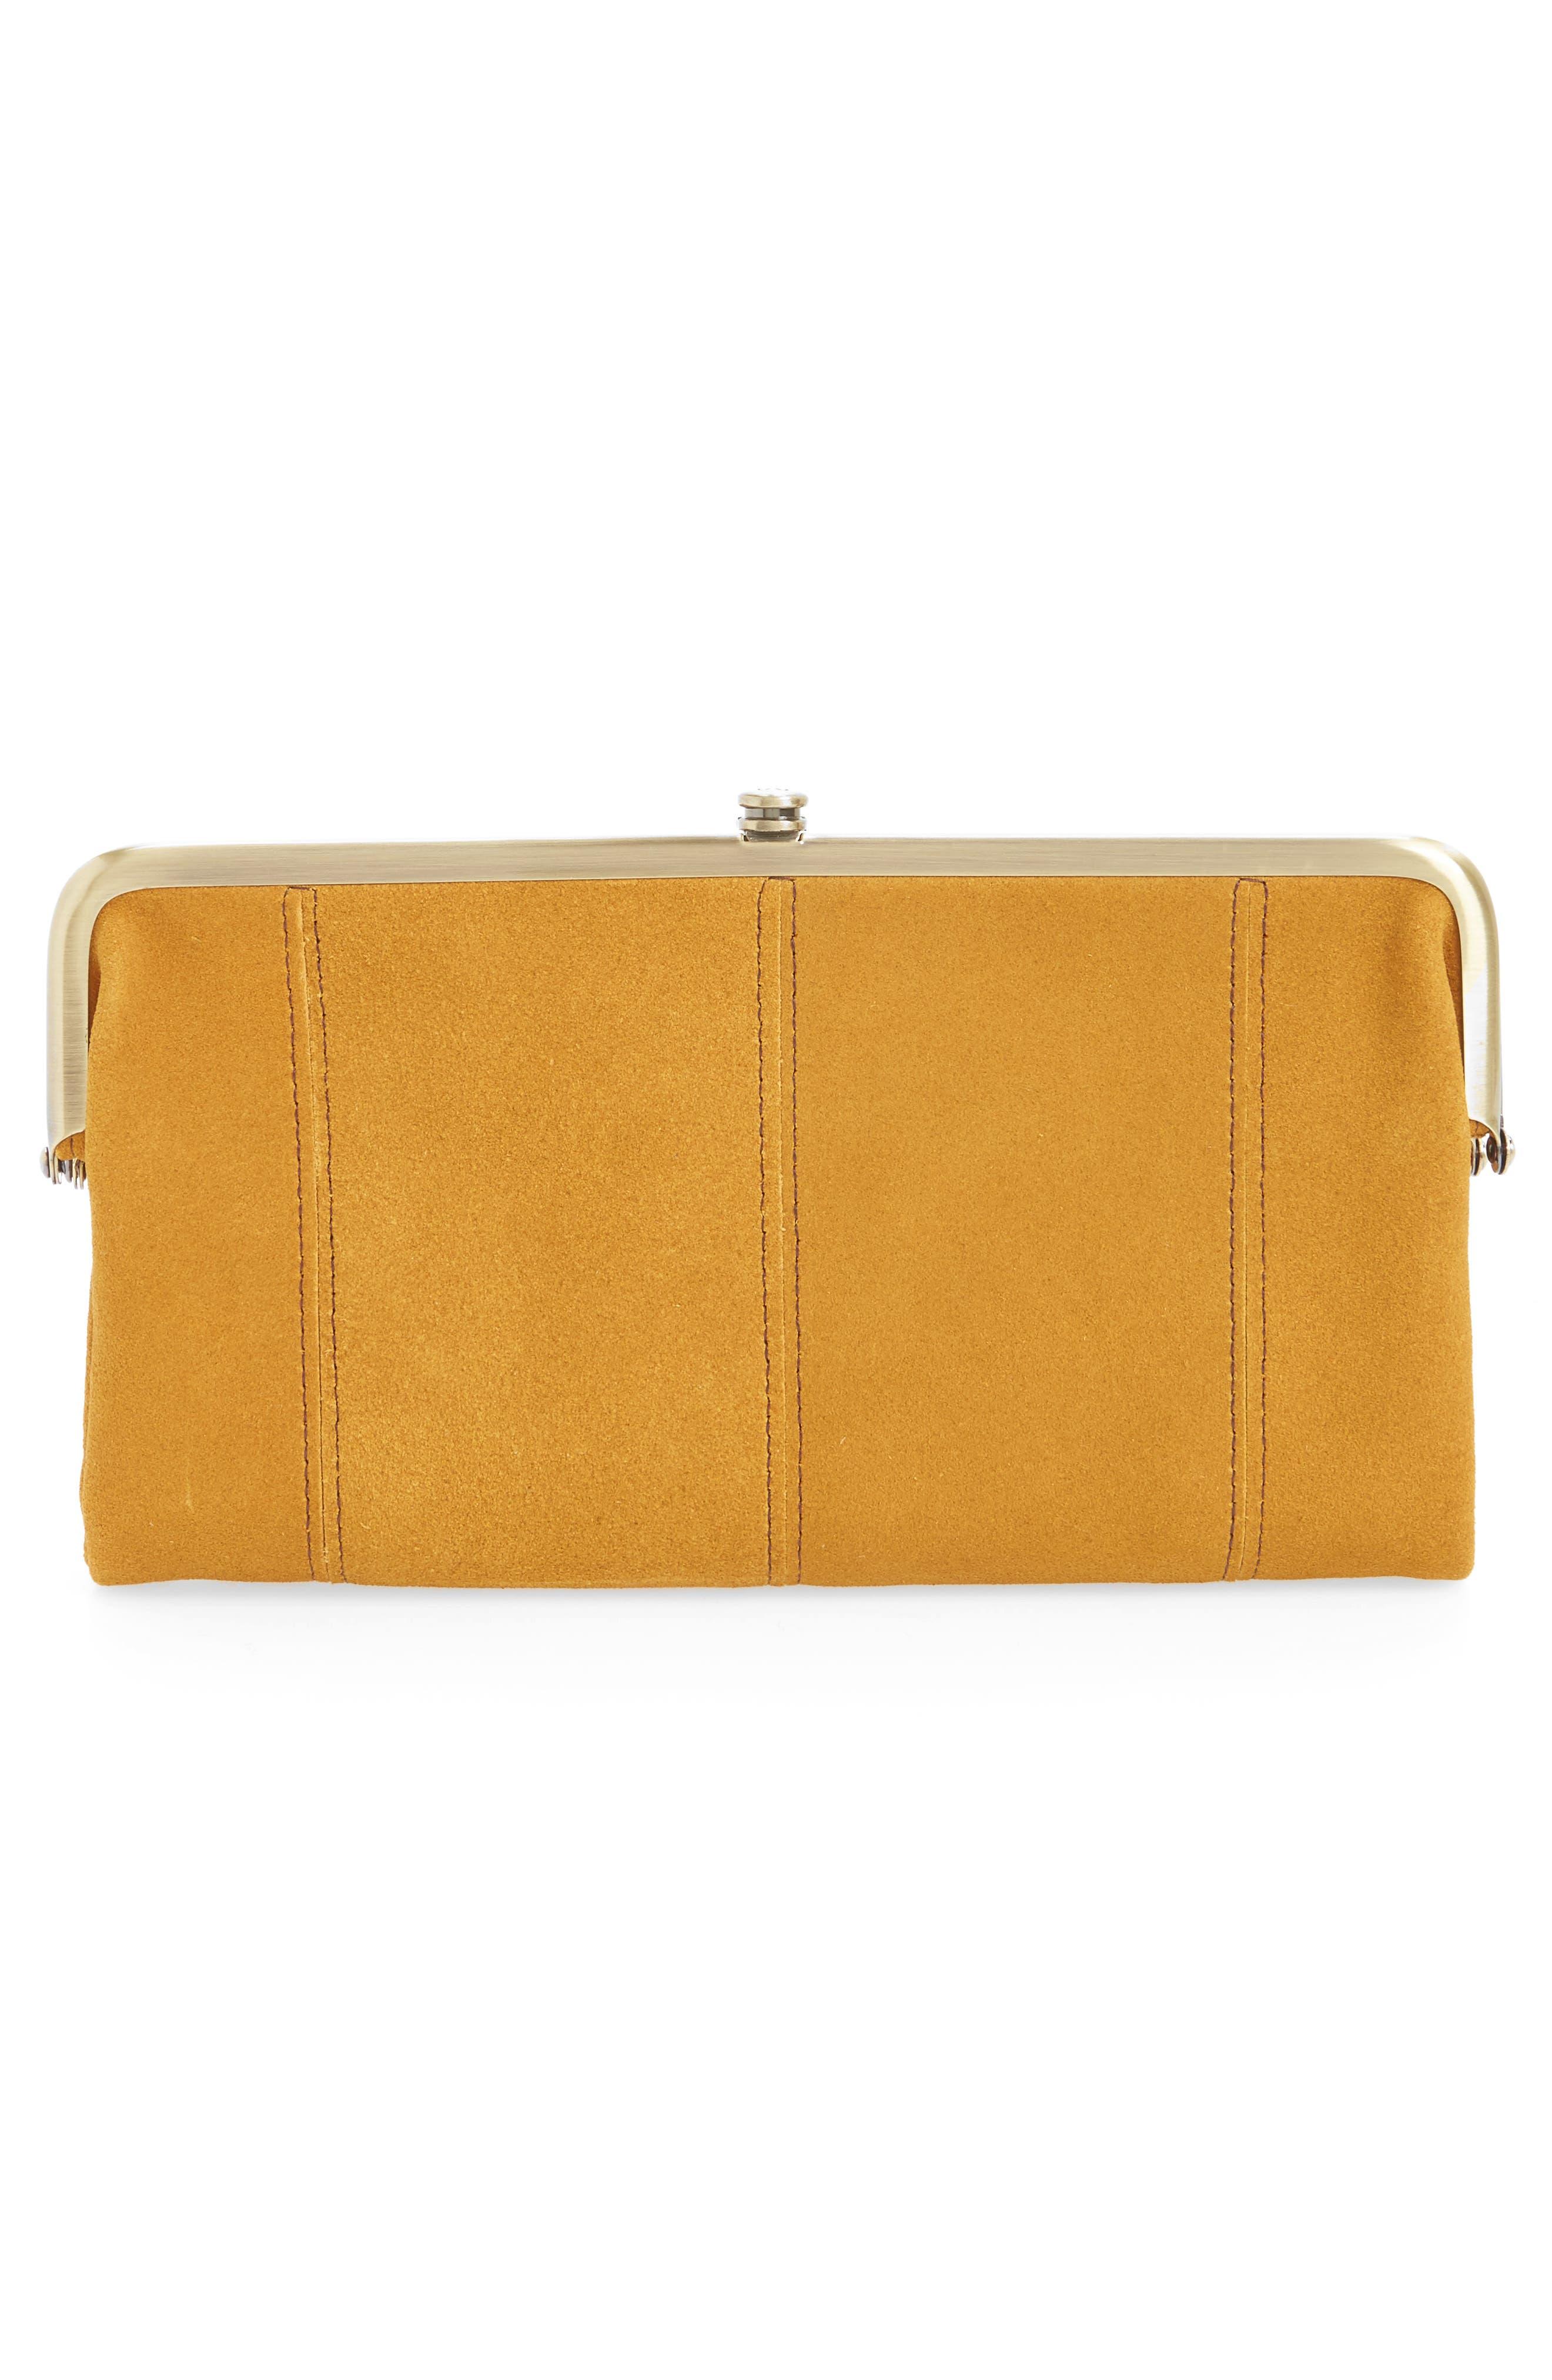 Lauren Colorblock Calfskin Leather Wallet,                             Alternate thumbnail 3, color,                             300